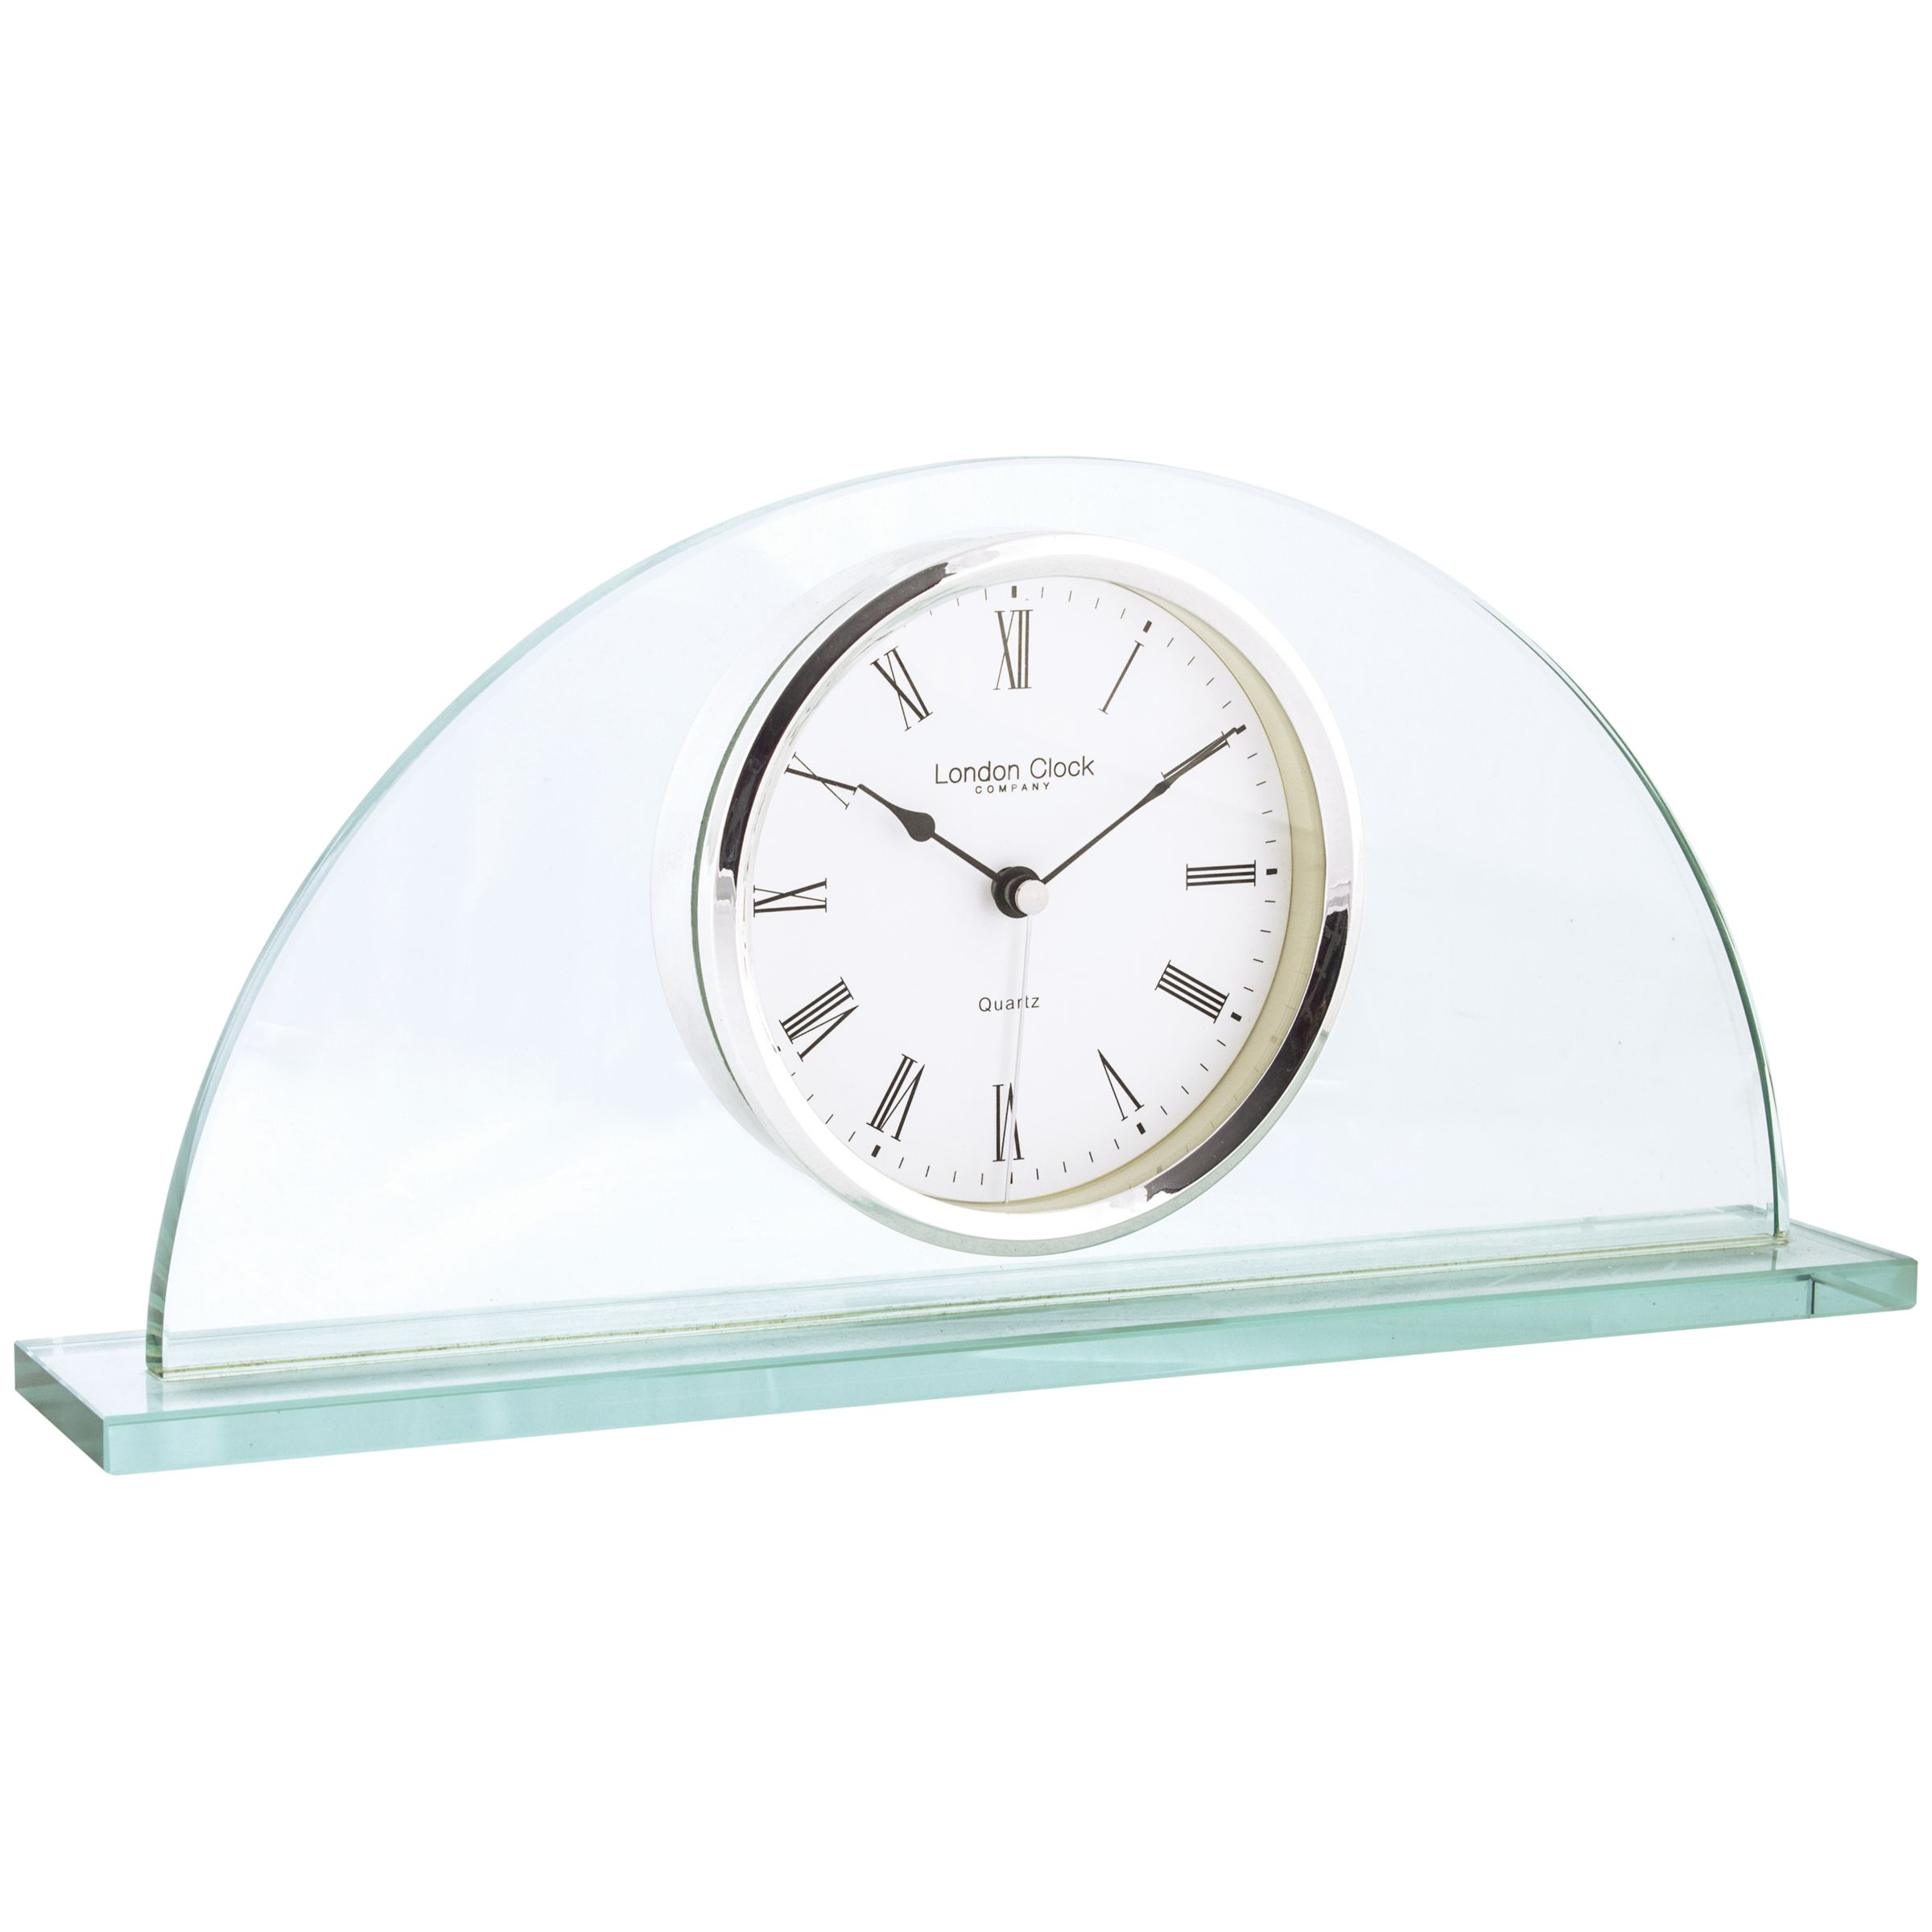 London Clock Company London Clock Company Glass Half Moon Mantel Clock, Clear